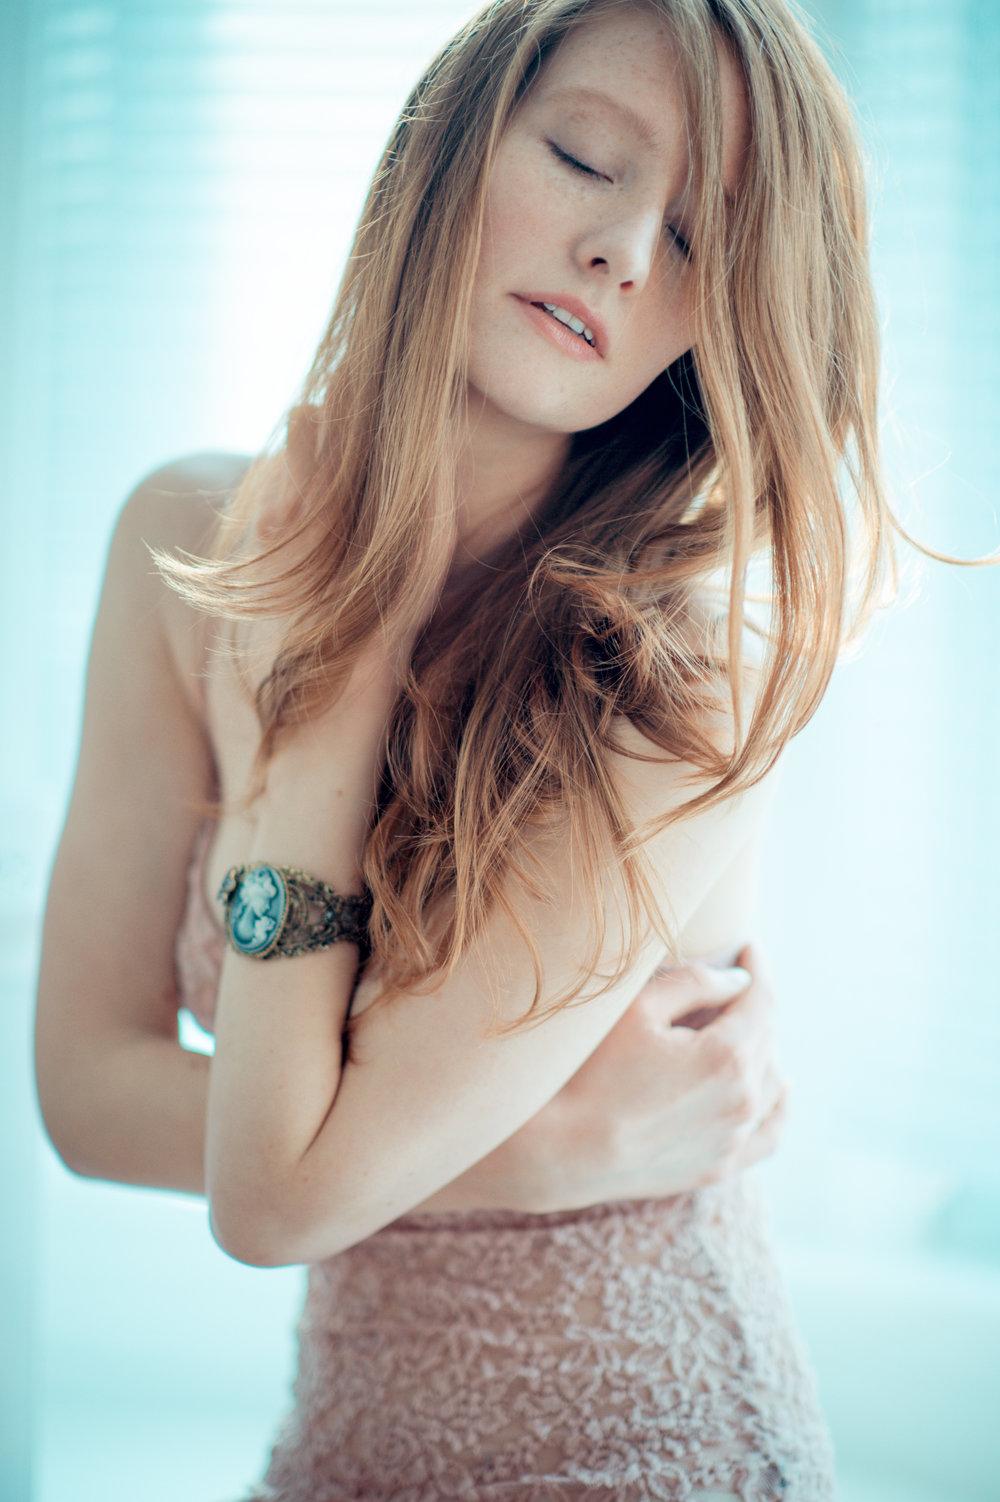 Marta-Hewson-Lifestyle-portrait-Shelagh-Moore-self-embrace.JPG